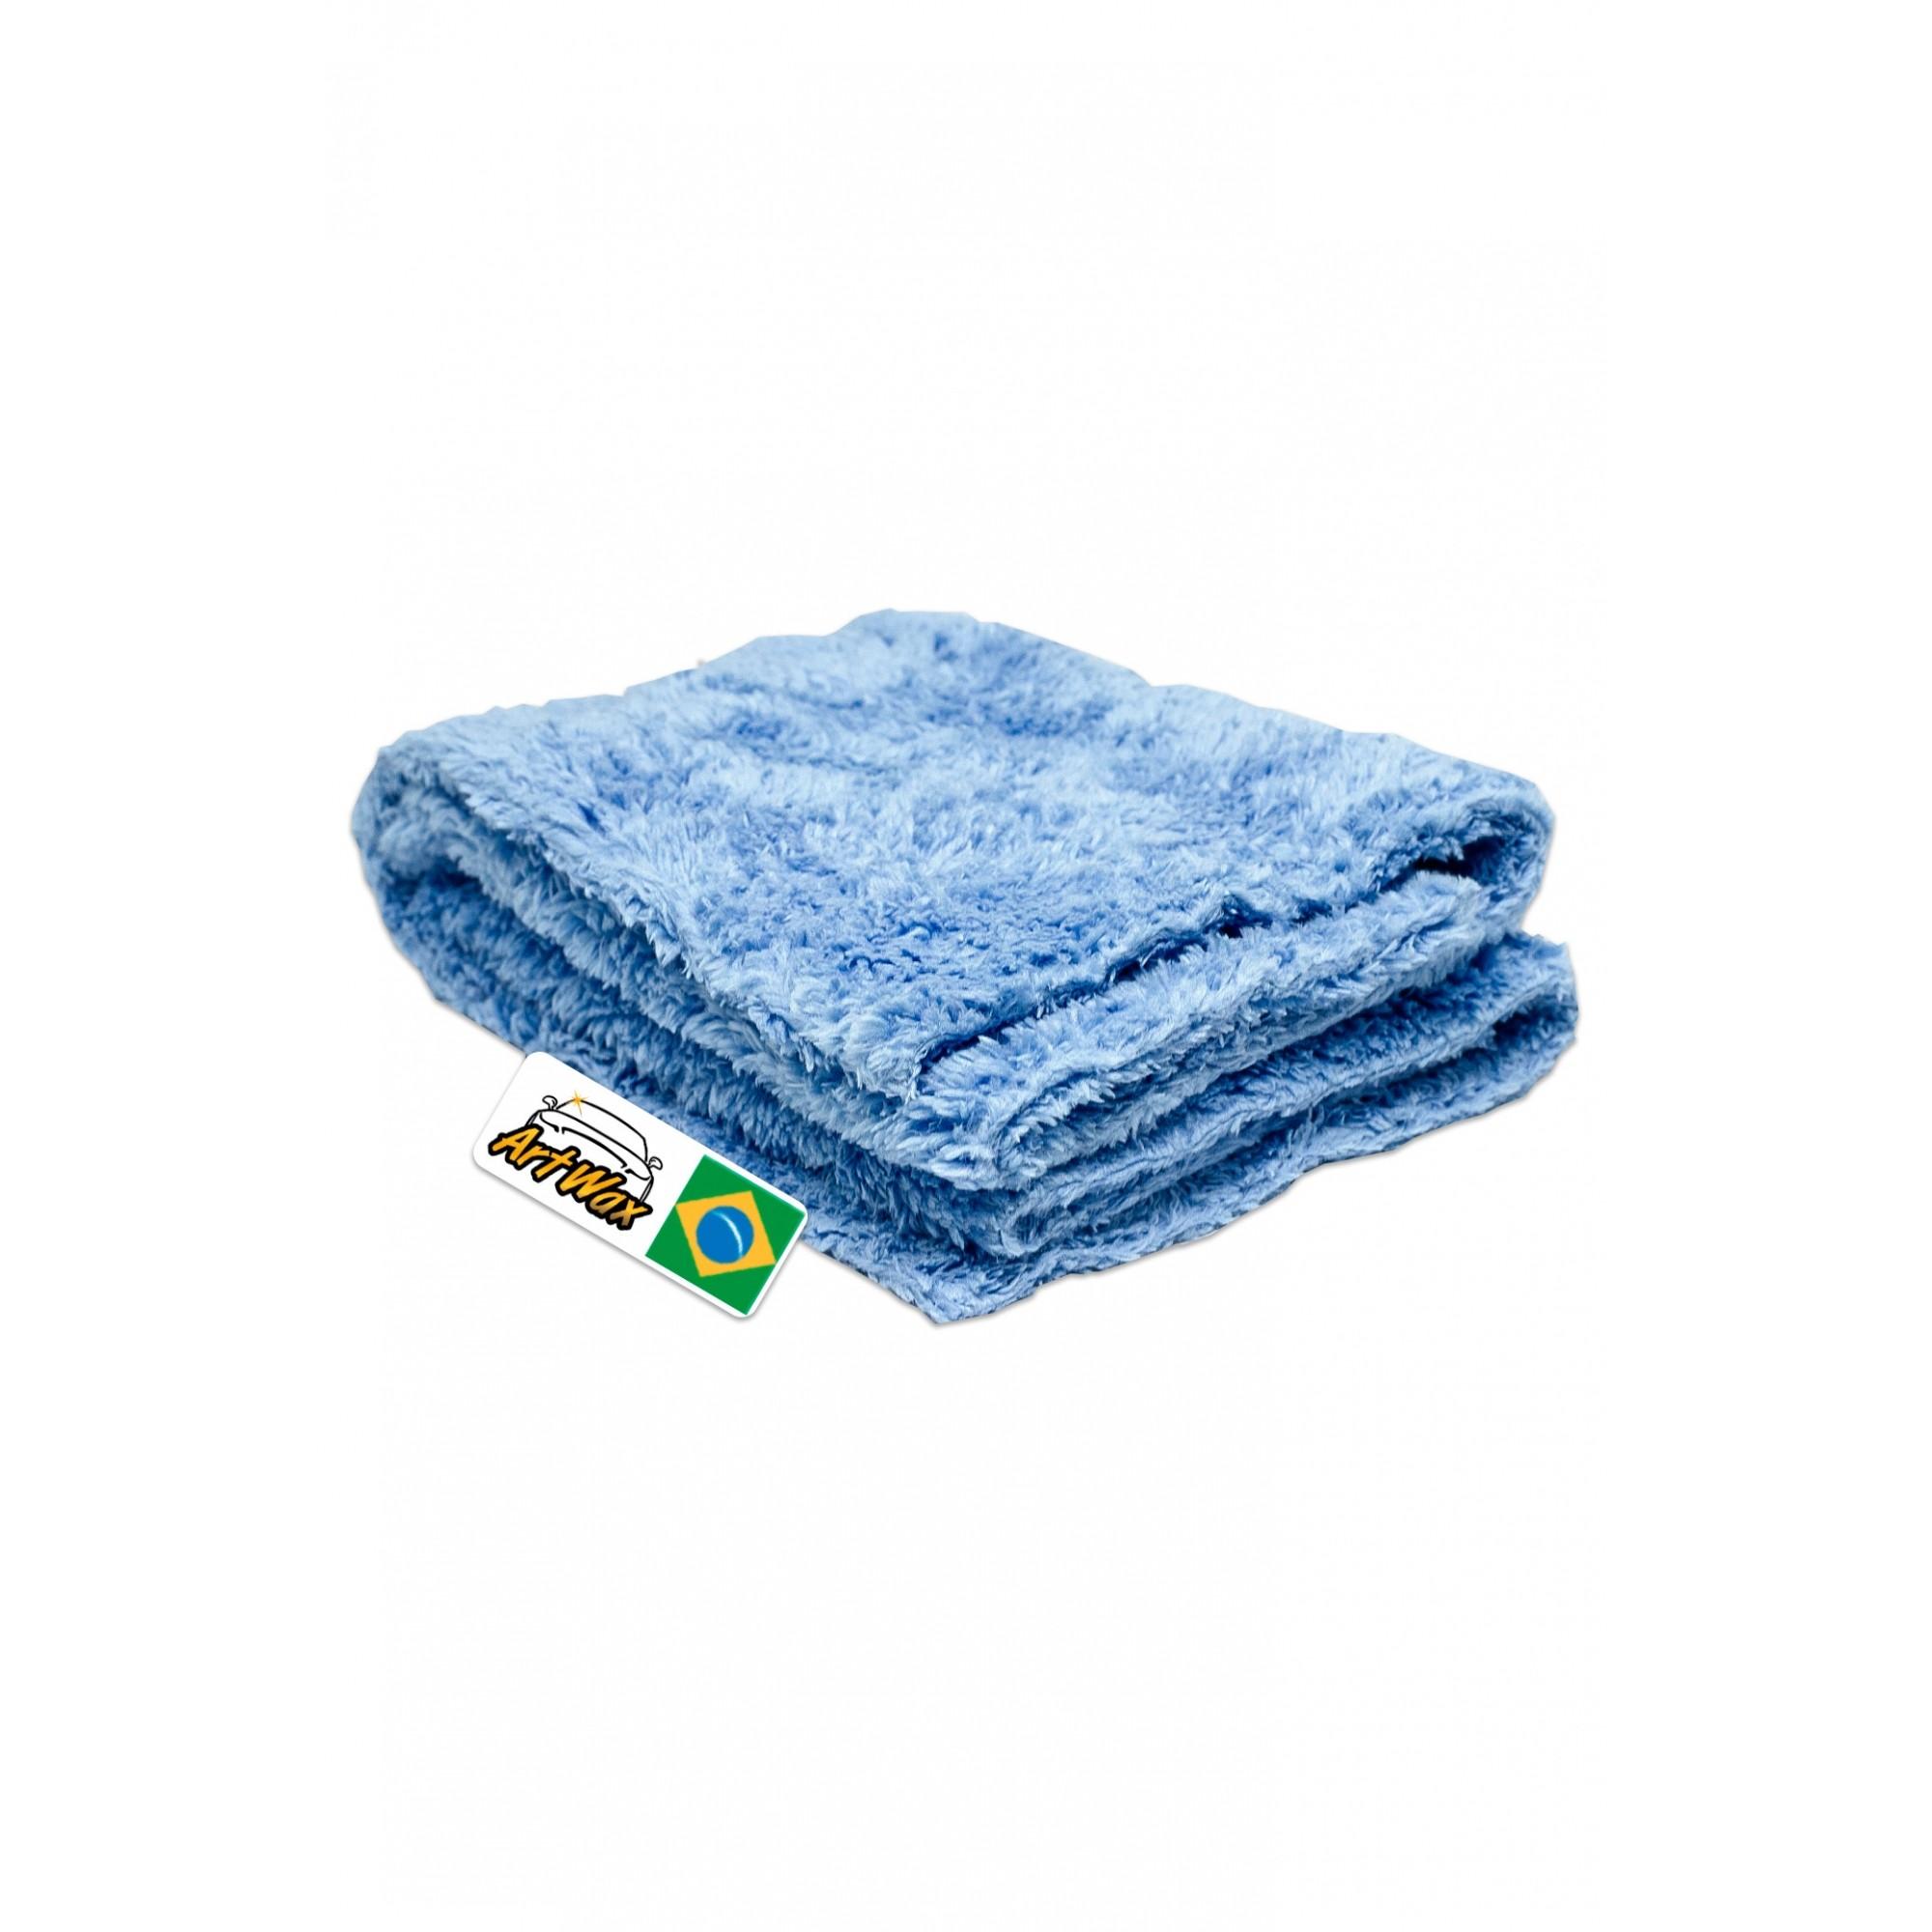 Toalha de Microfibra Azul DB Towel Polish 40x40cm - 500gsm Dub Boyz